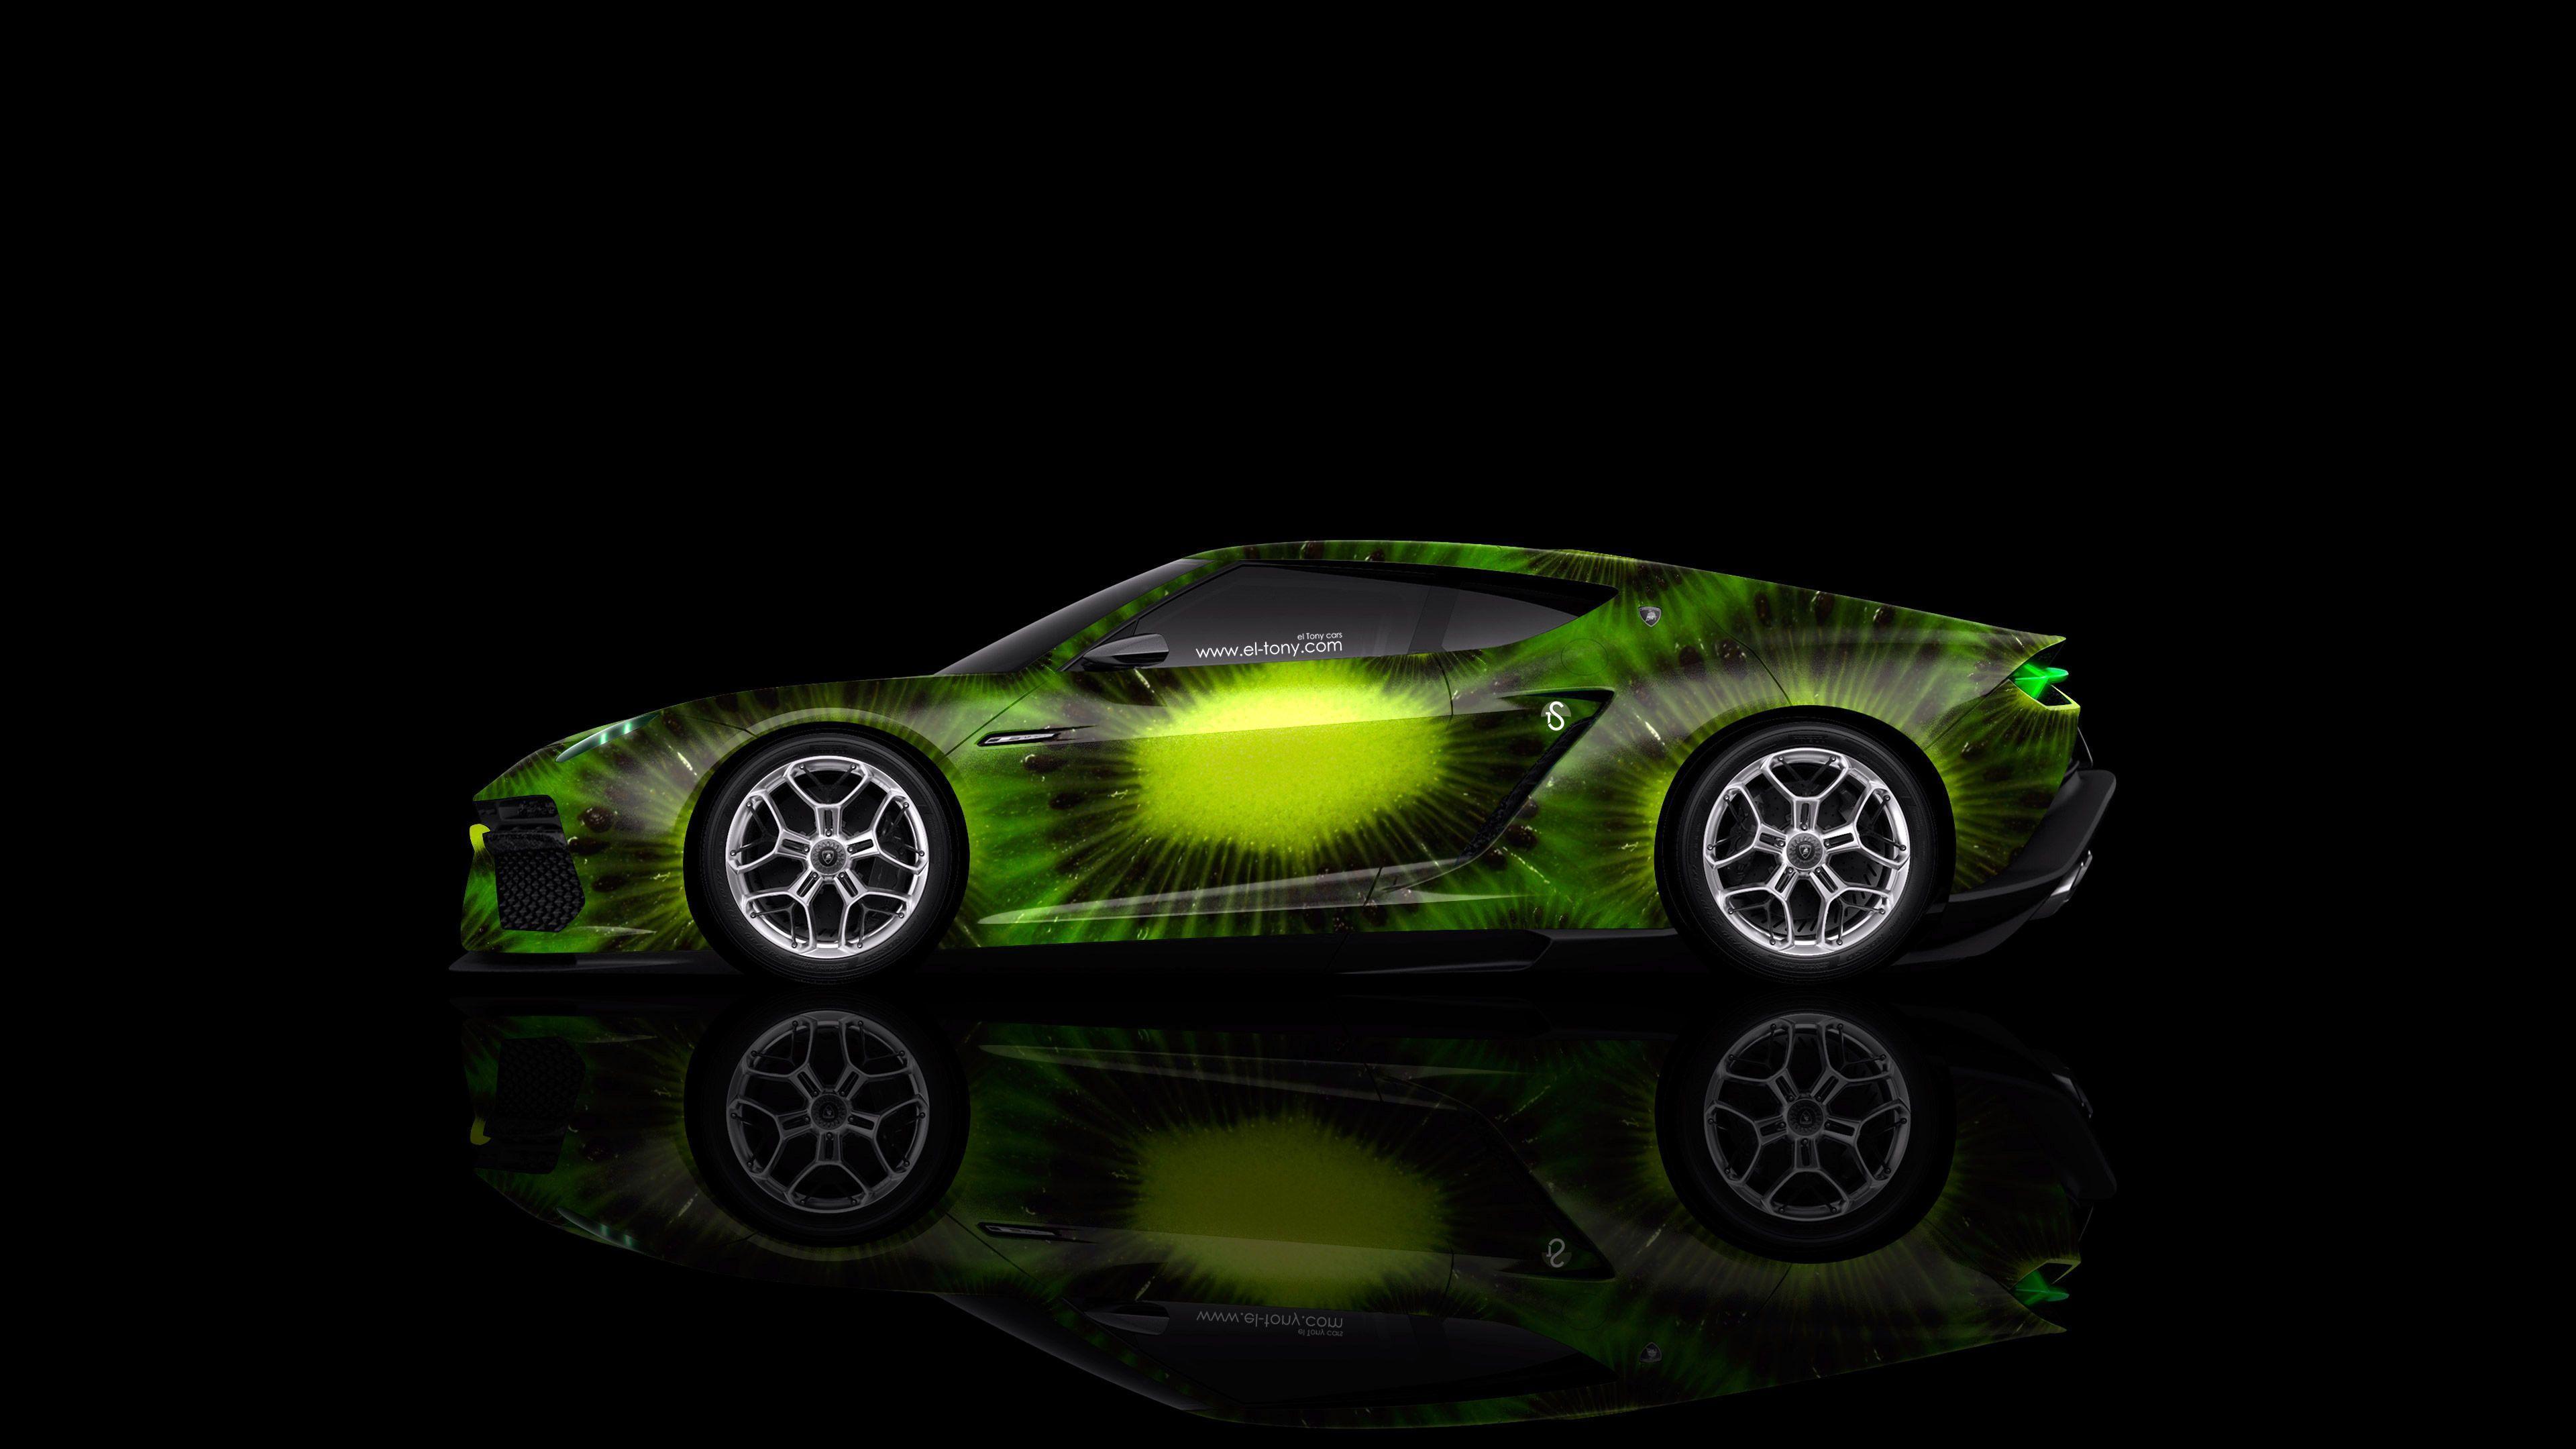 4K Lamborghini Asterion Side Kiwi Aerography Car 2014 | El Tony